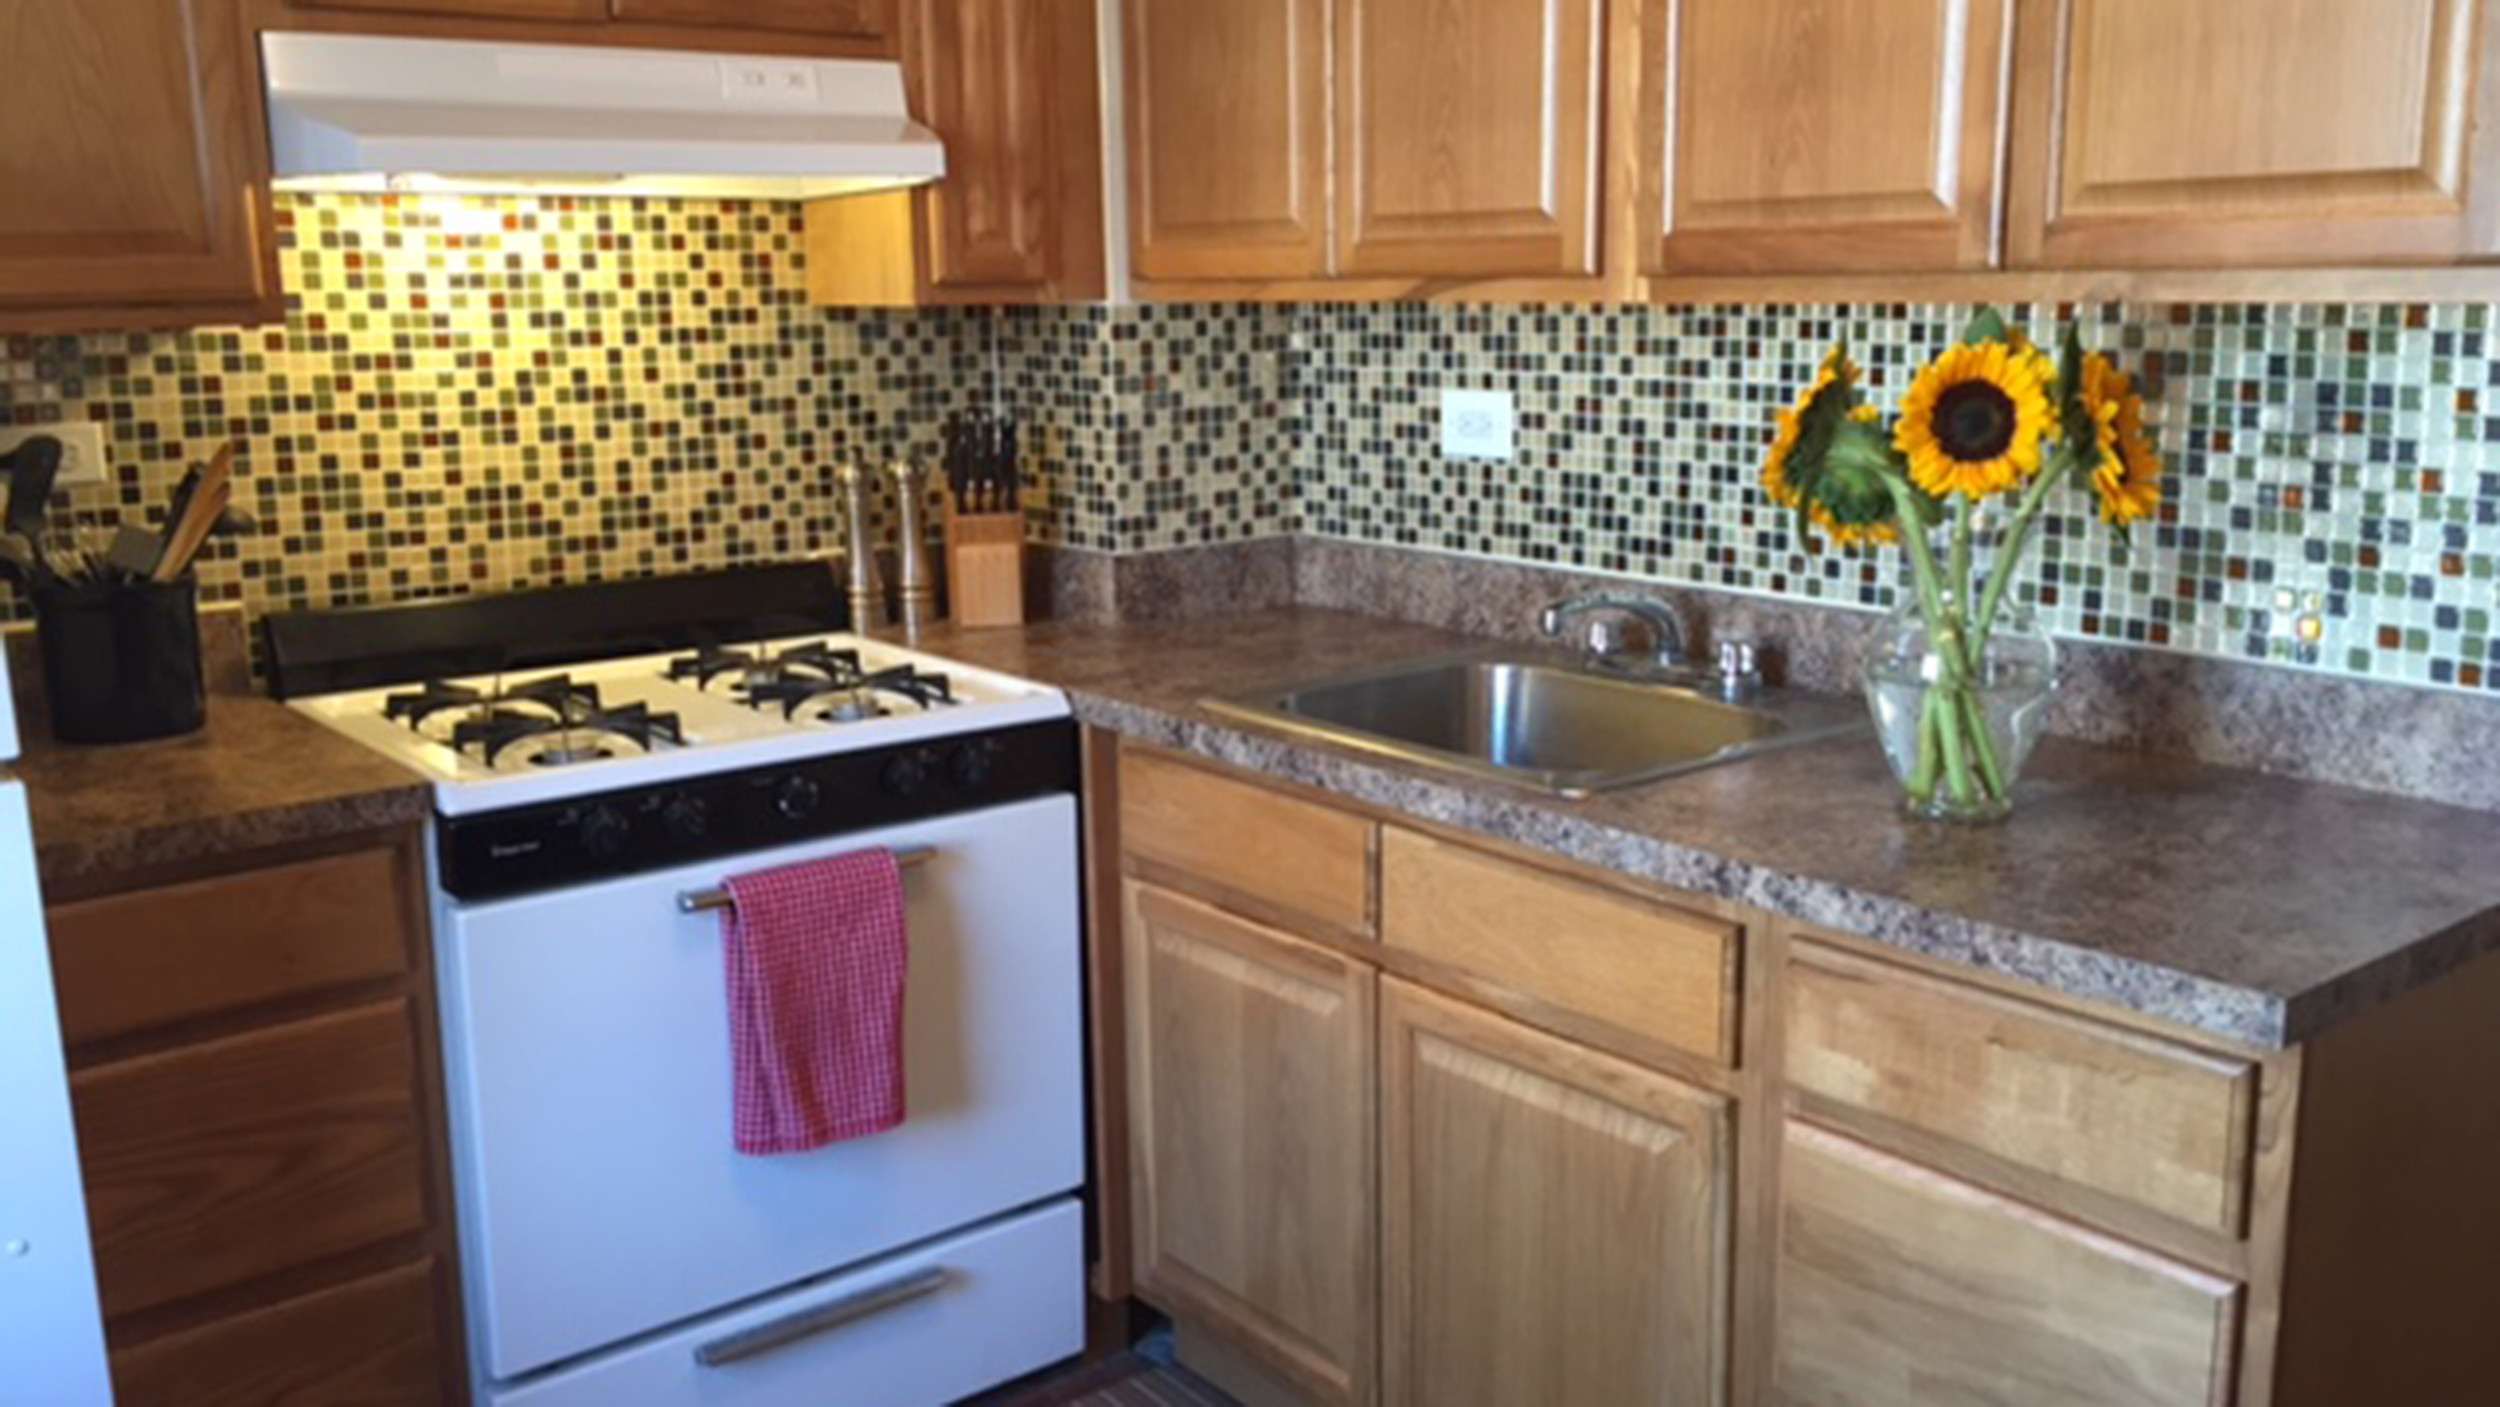 Kitchen Peel And Stick Backsplash  Kitchen Inspiring Aspect Peel And Stick With Simple